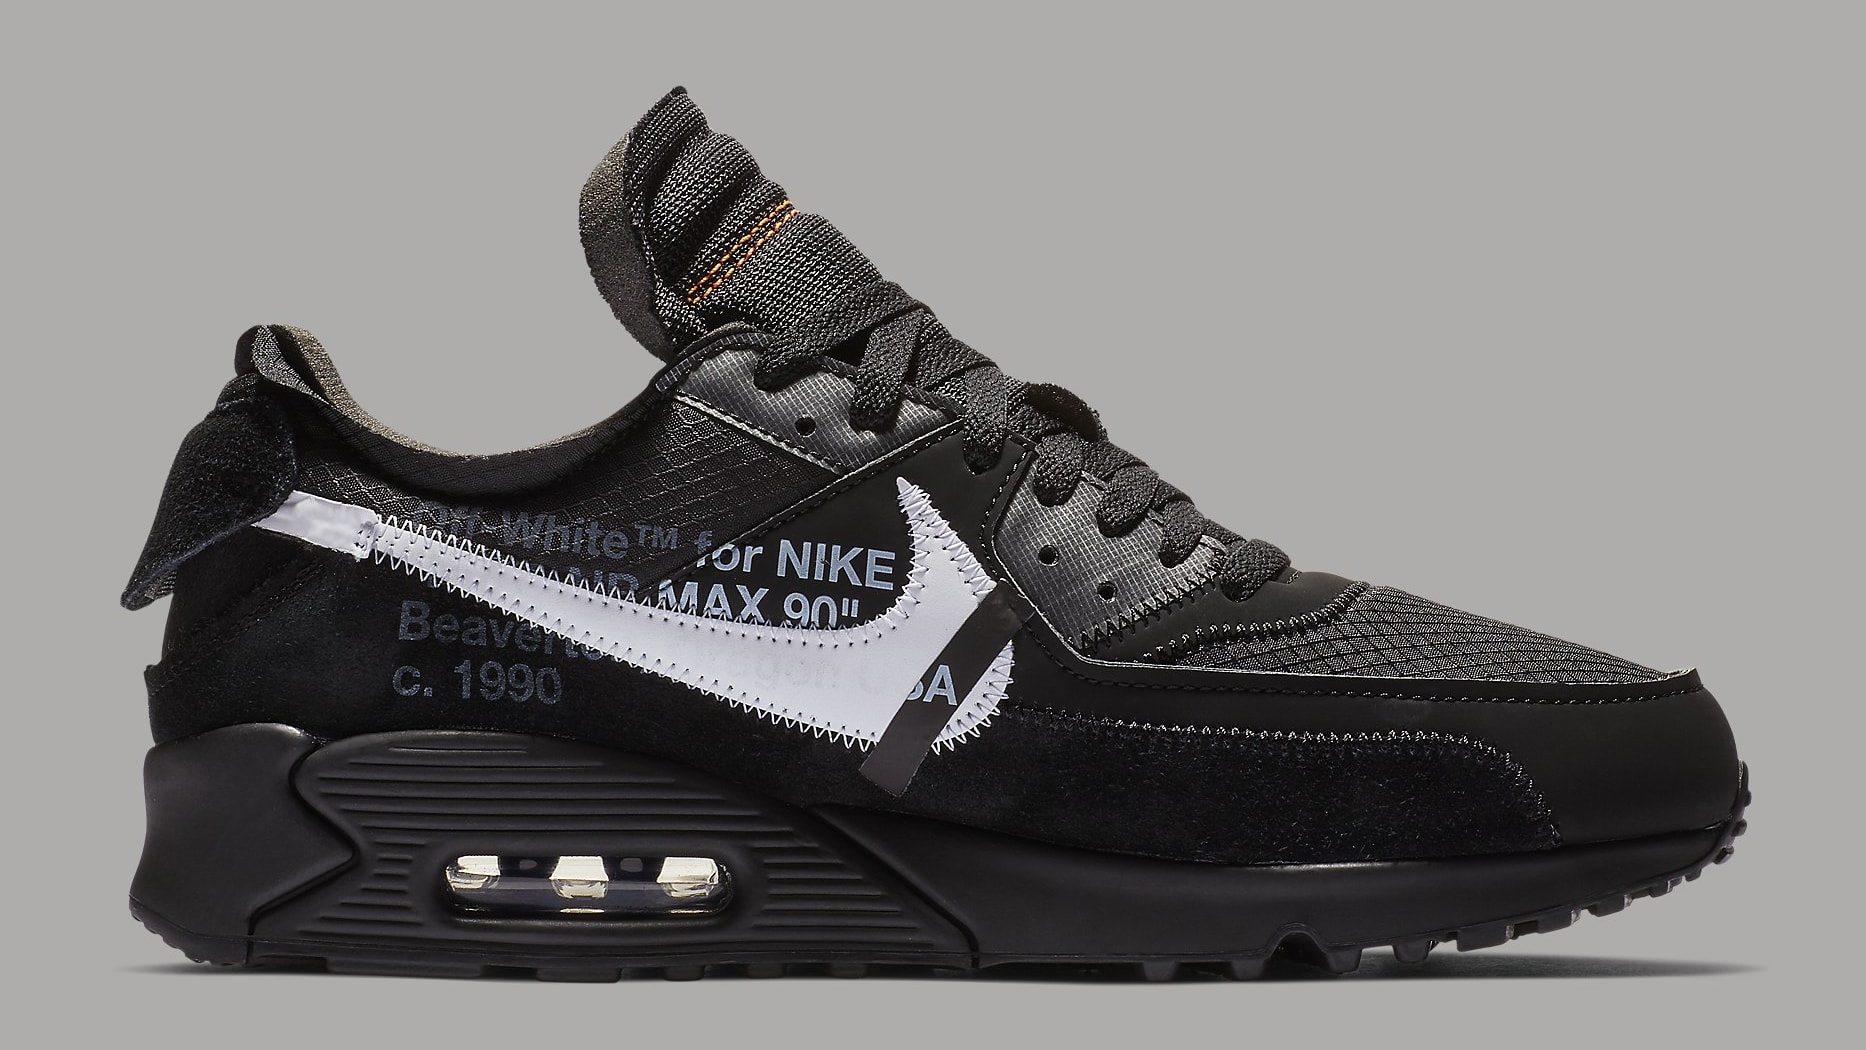 super populaire 2e409 2cf93 Off-White x Nike Air Max 90 Black Release Date AA7293-001 ...